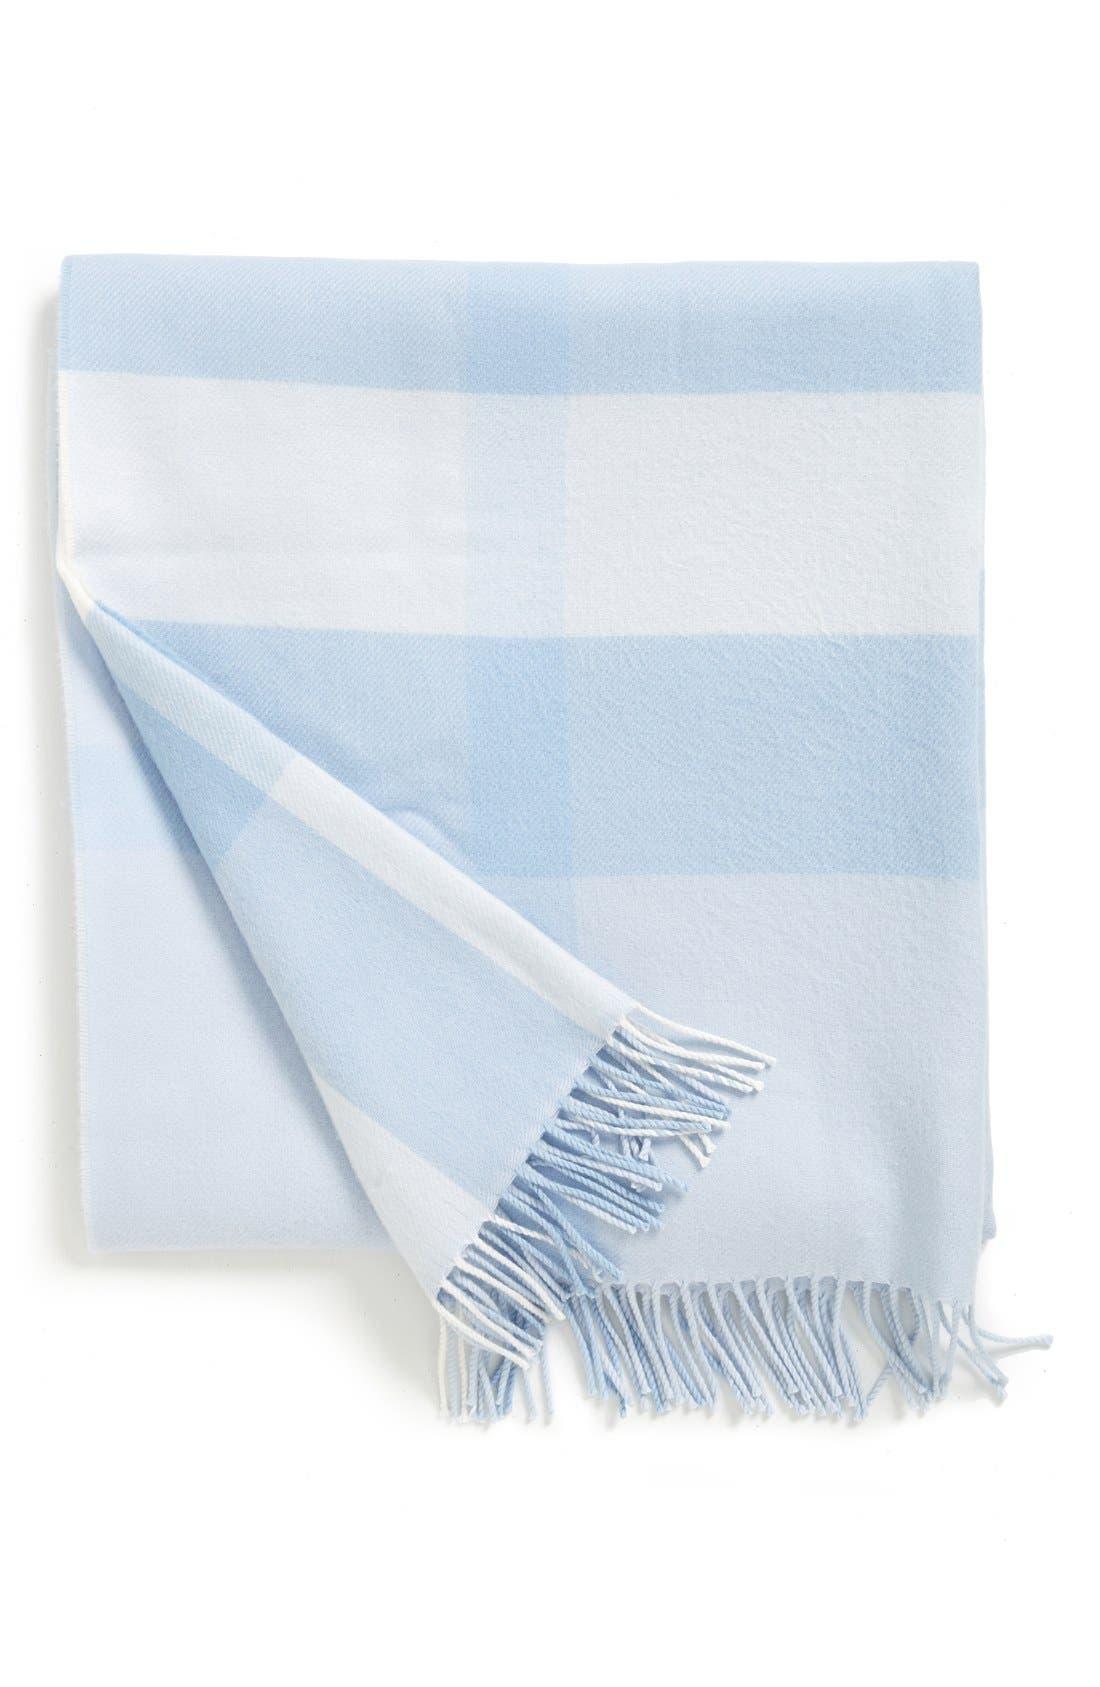 Merino Wool Blanket,                         Main,                         color, Ice Blue